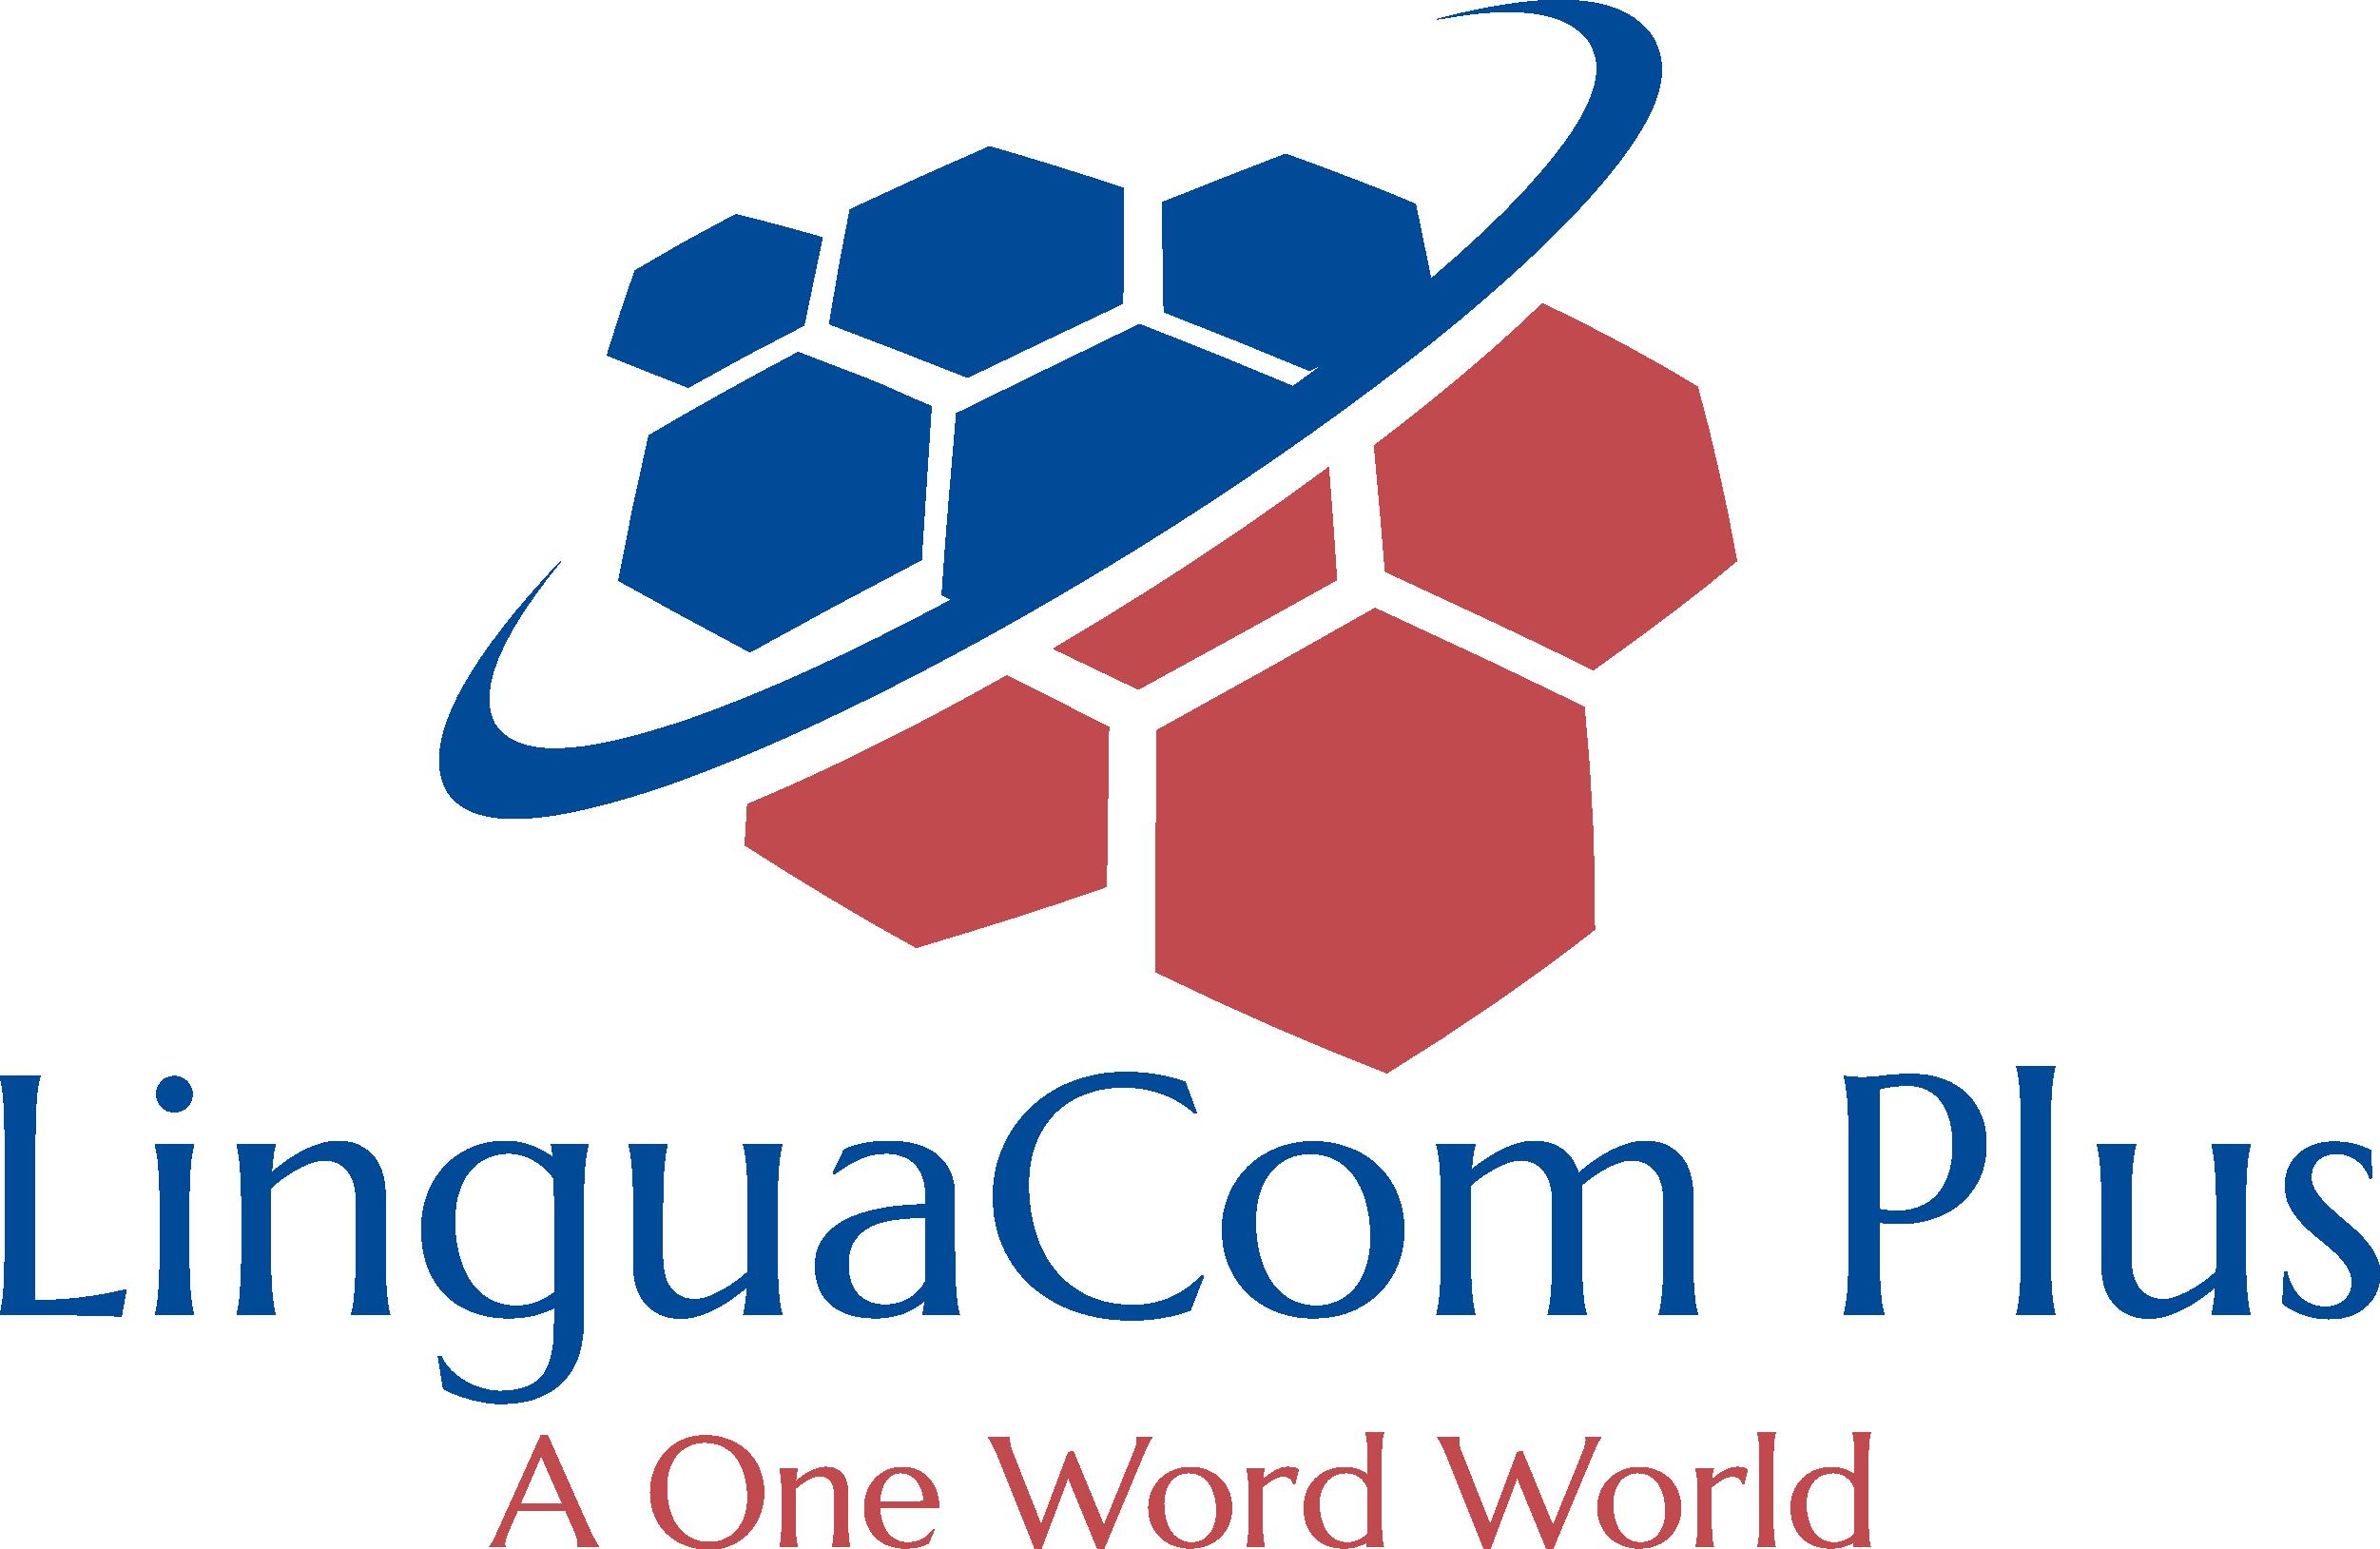 The mission linguacom plus. Vision clipart company vision